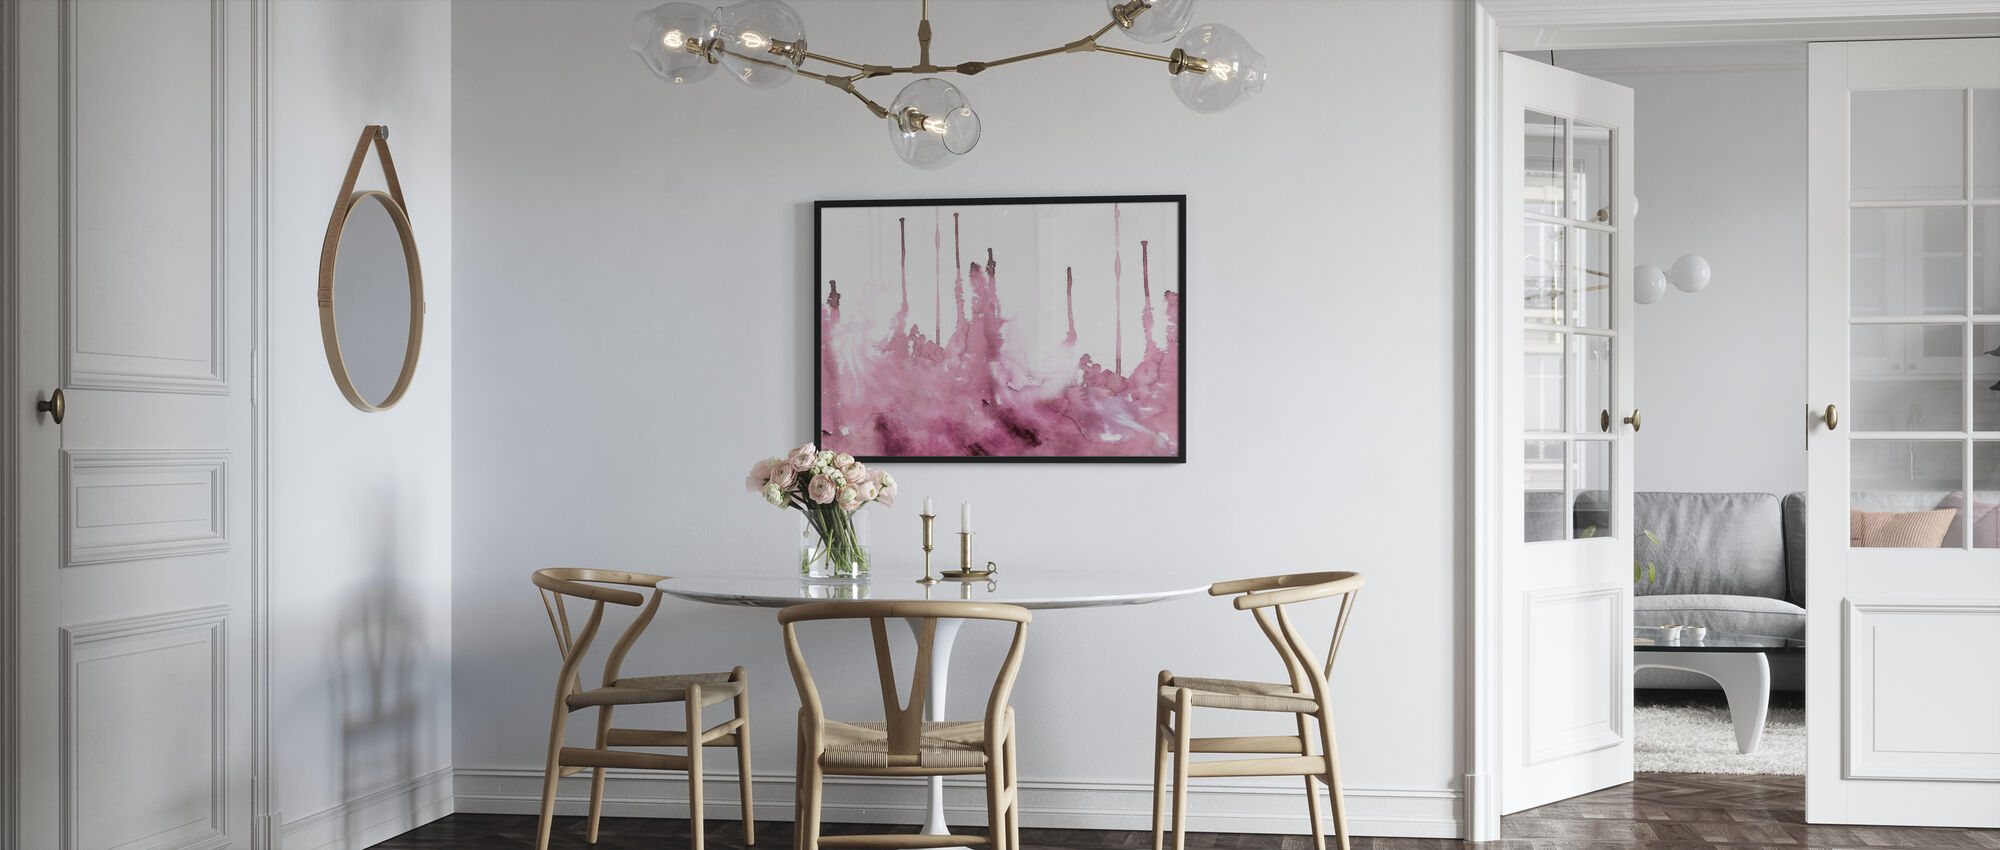 Watercolor Study - Rosé - Poster - Kitchen